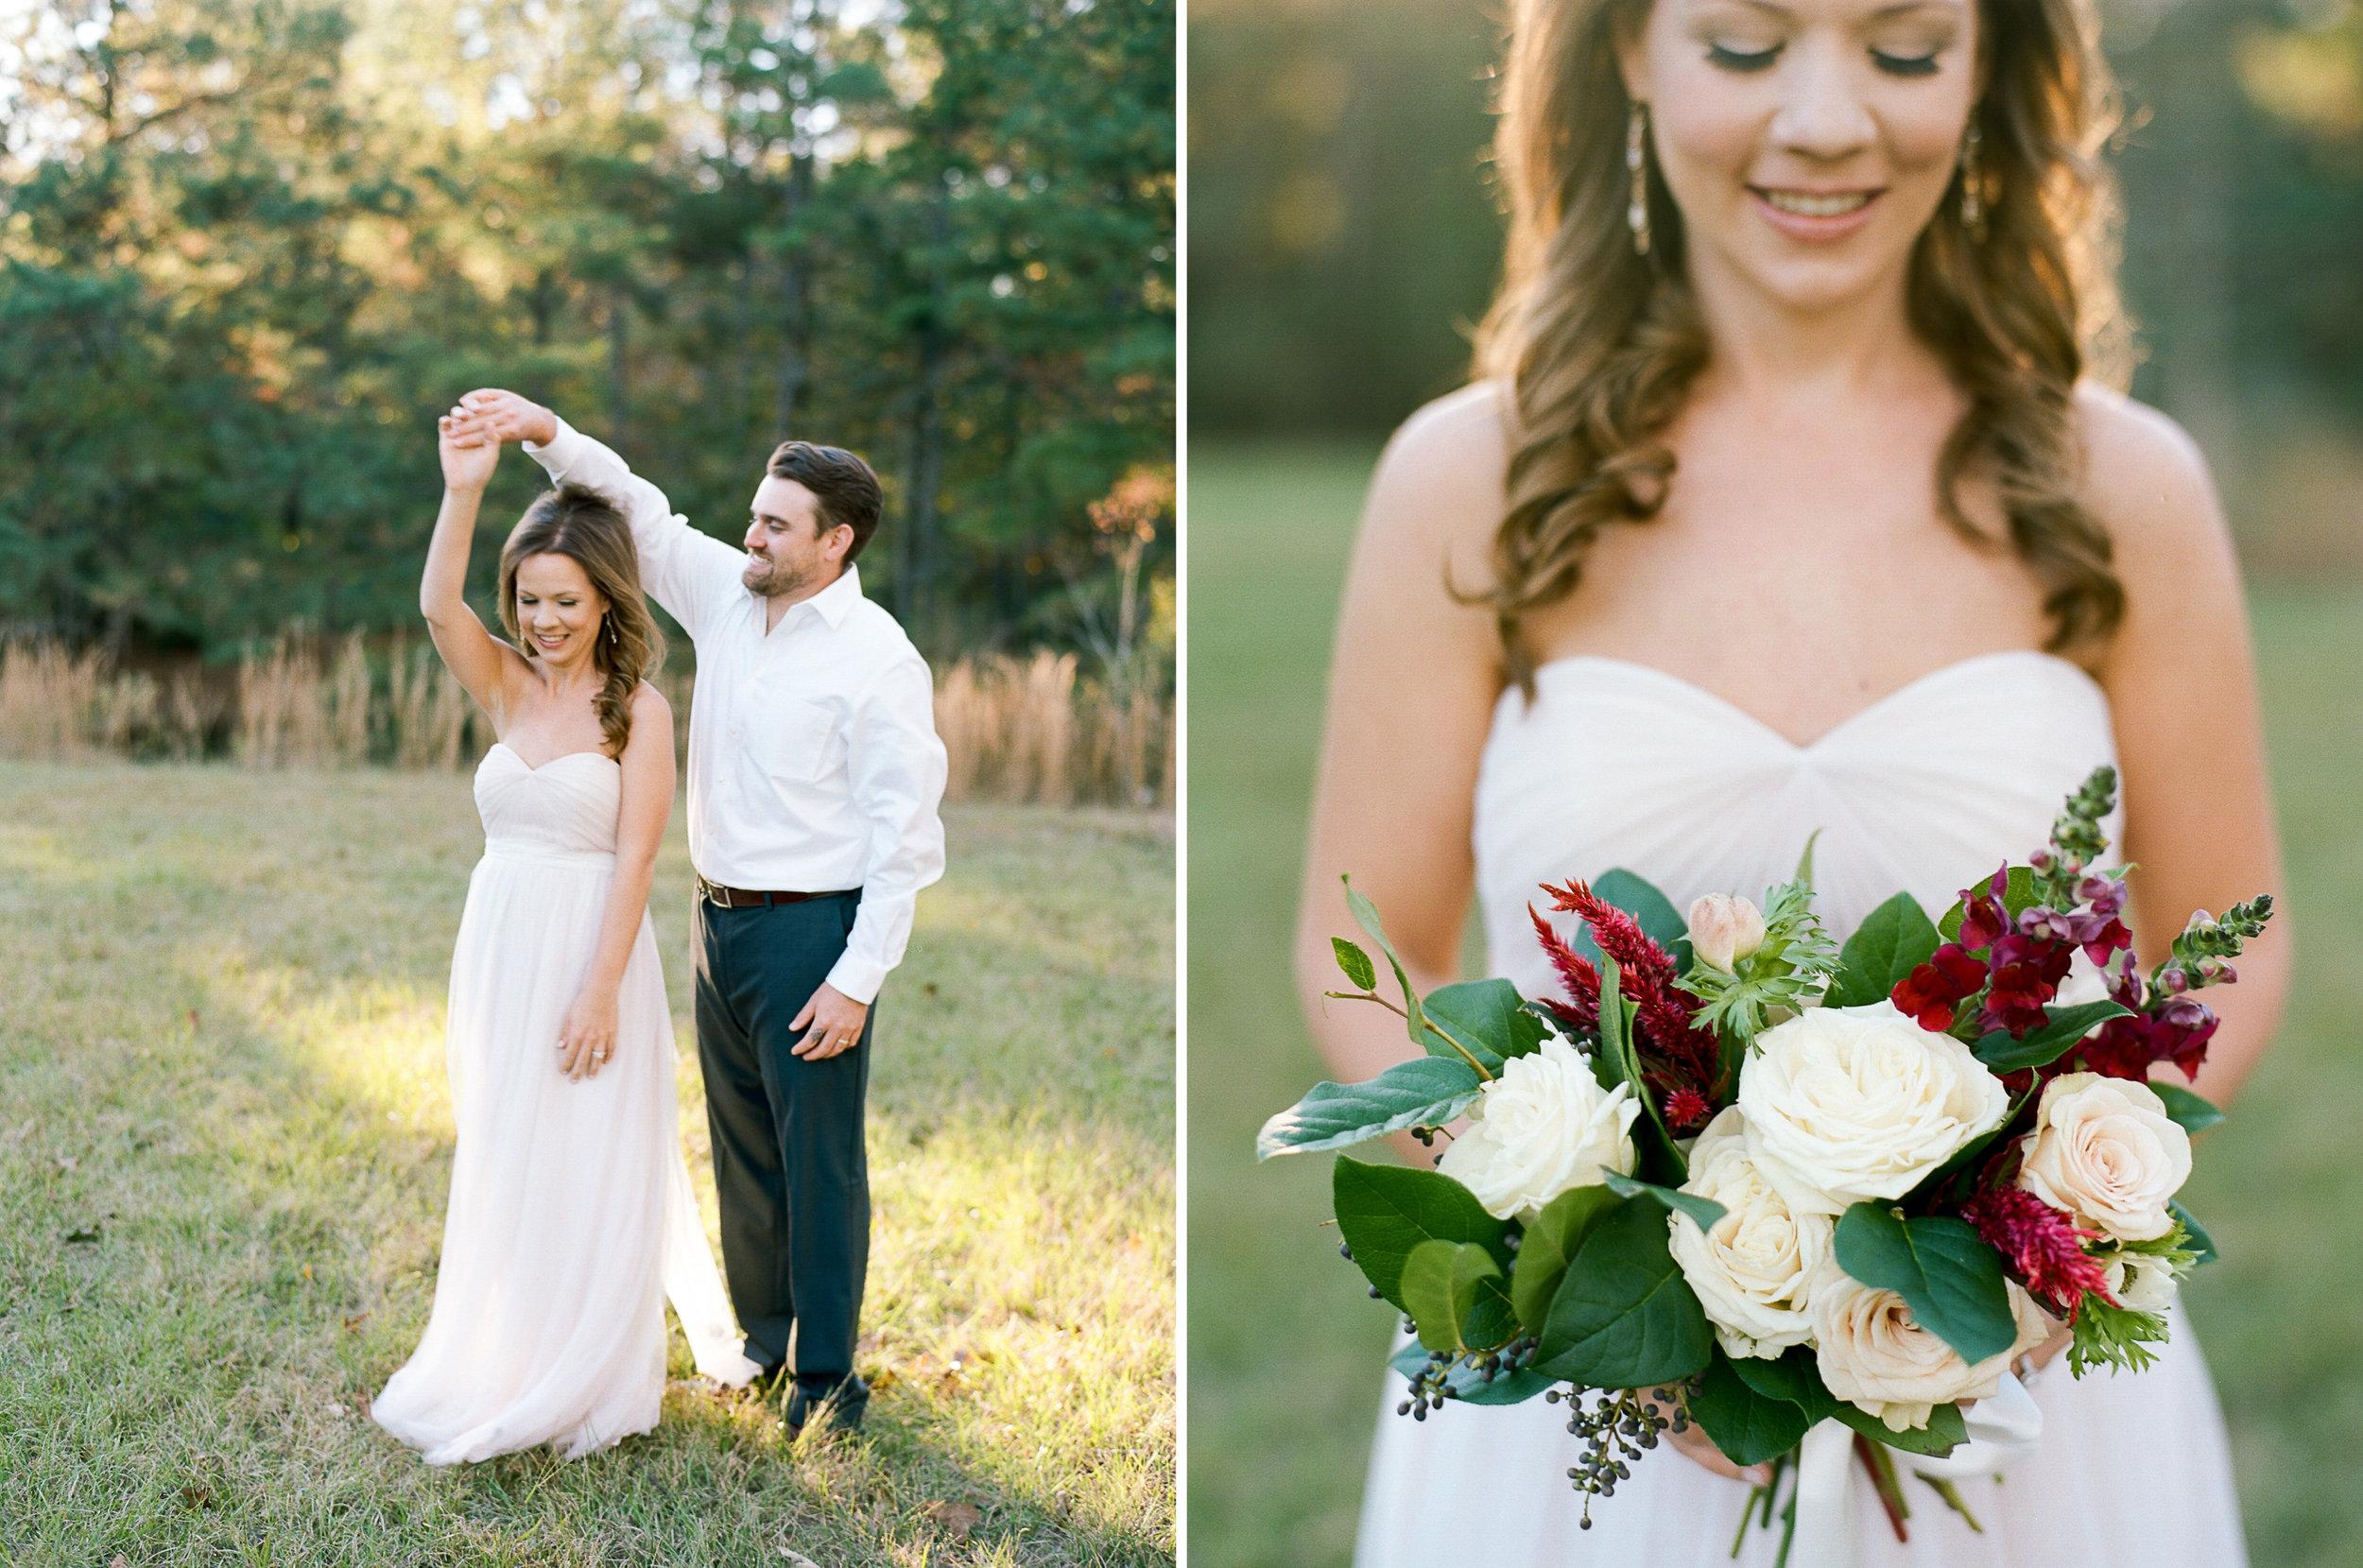 dana-fernandez-photography-houston-wedding-photographer-portraits-engagements-anniversary-session-film-photographer-austin-wedding-photographer-107.jpg